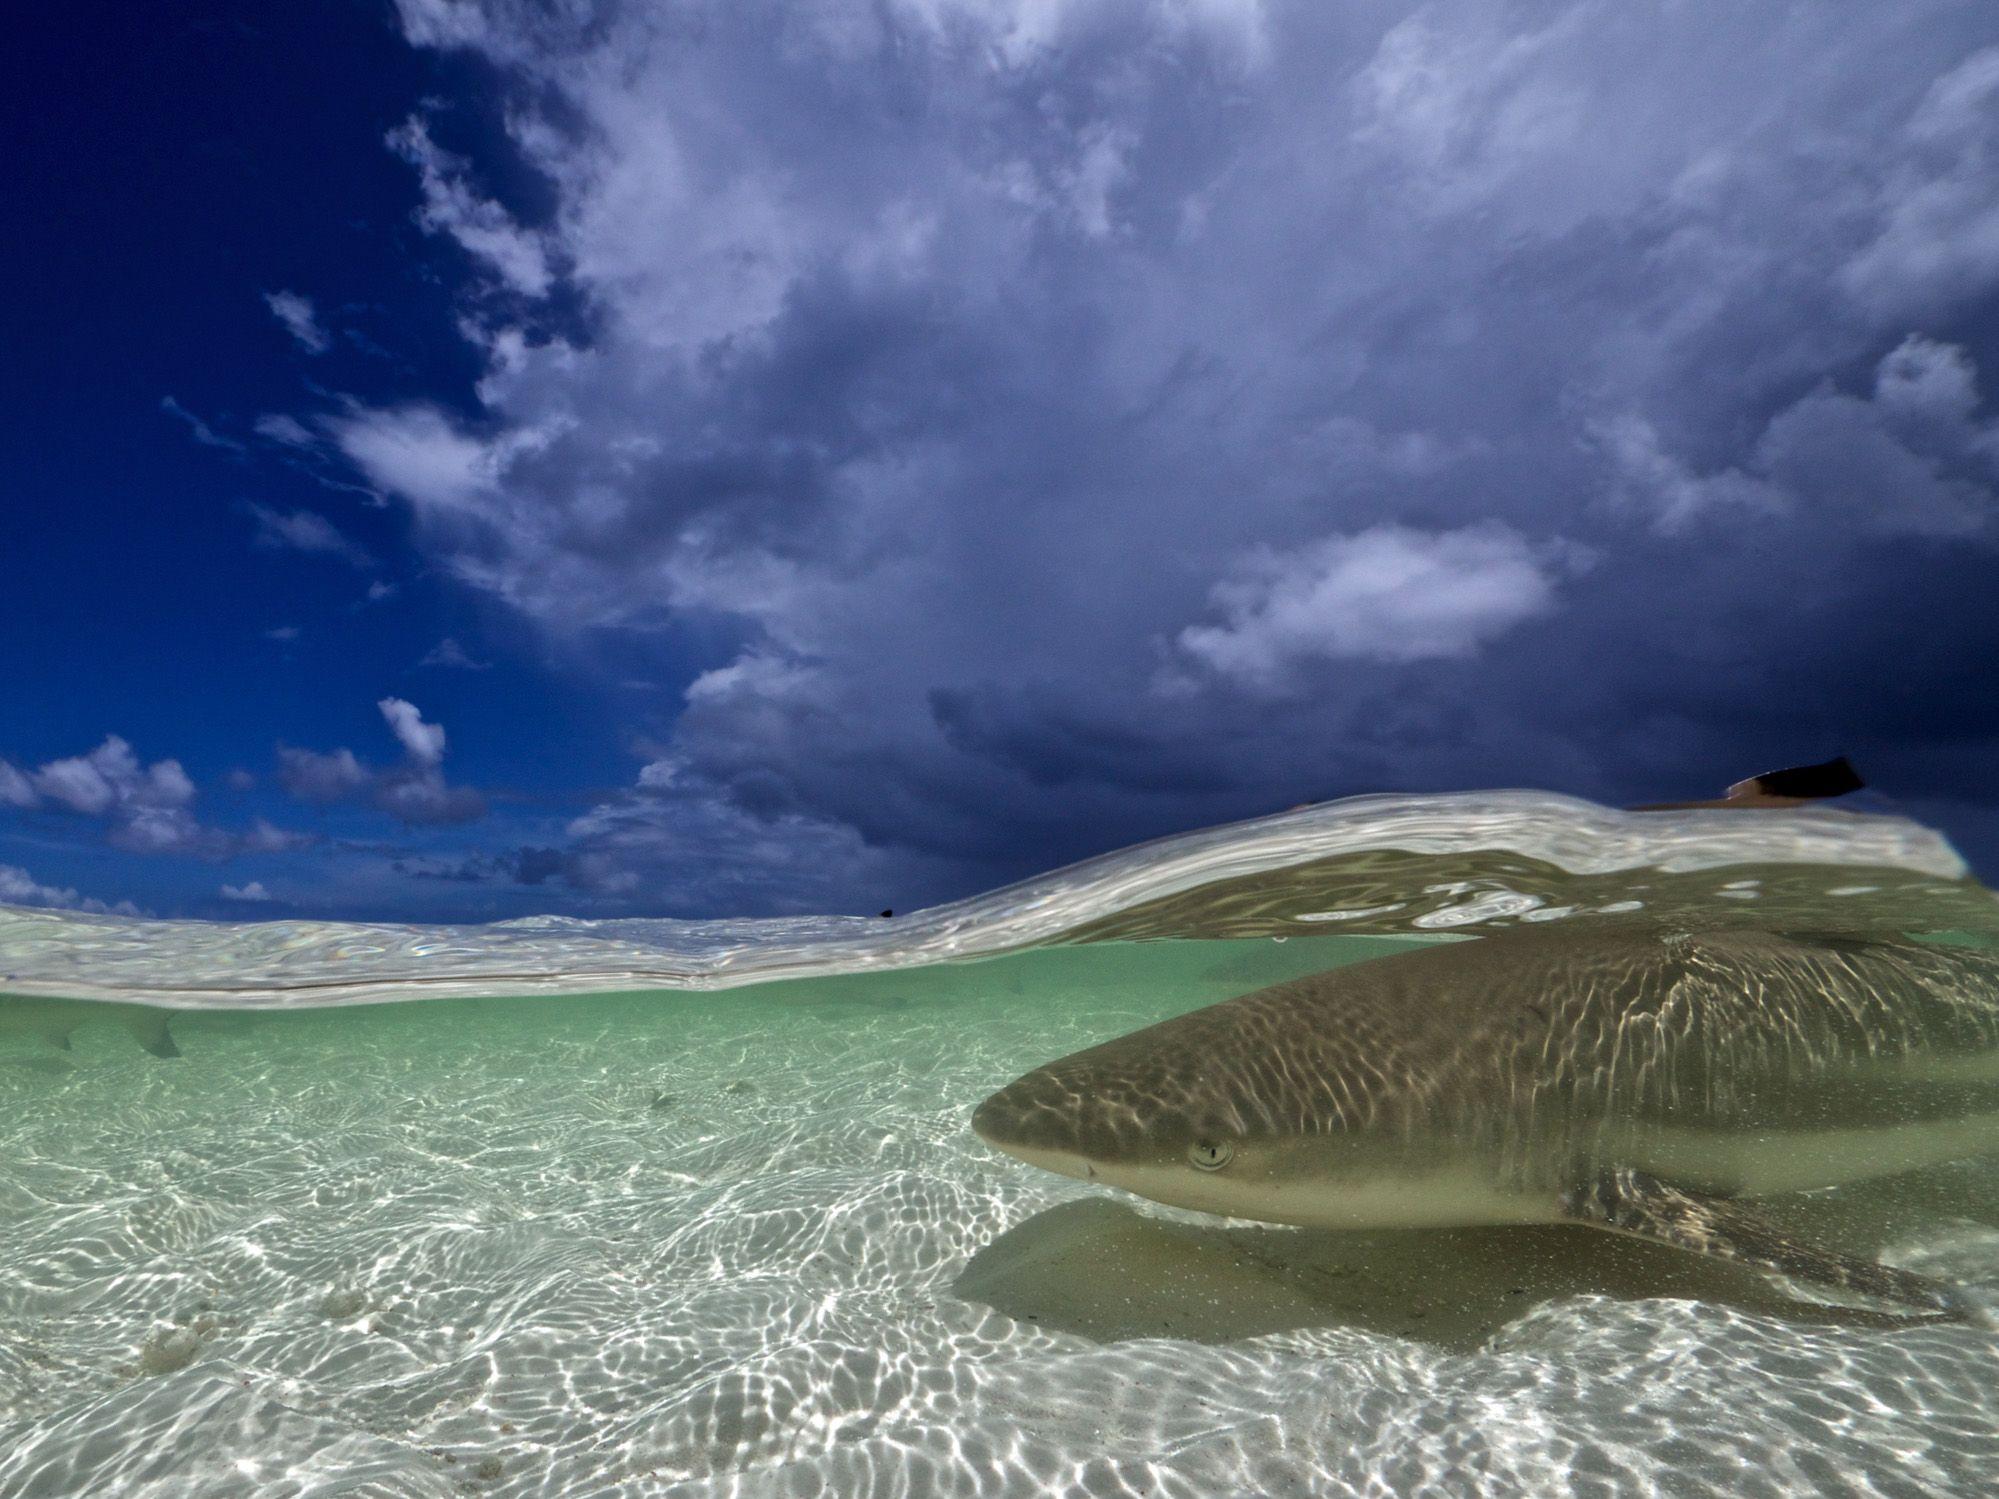 Blacktip sharks school in Seychelles shallows. Photo by Joe Lepore